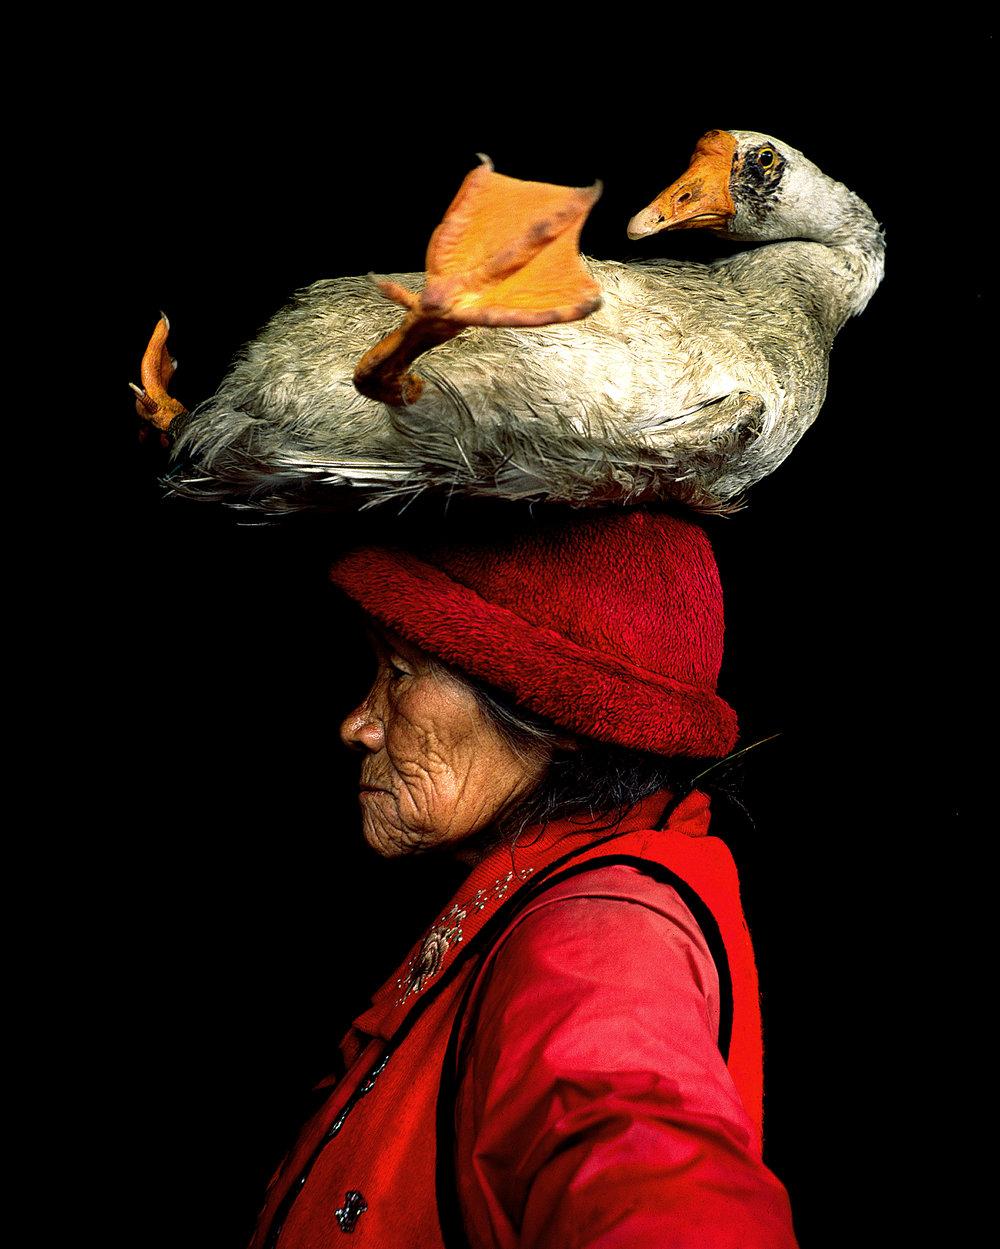 Image by Cristina Mittermeier